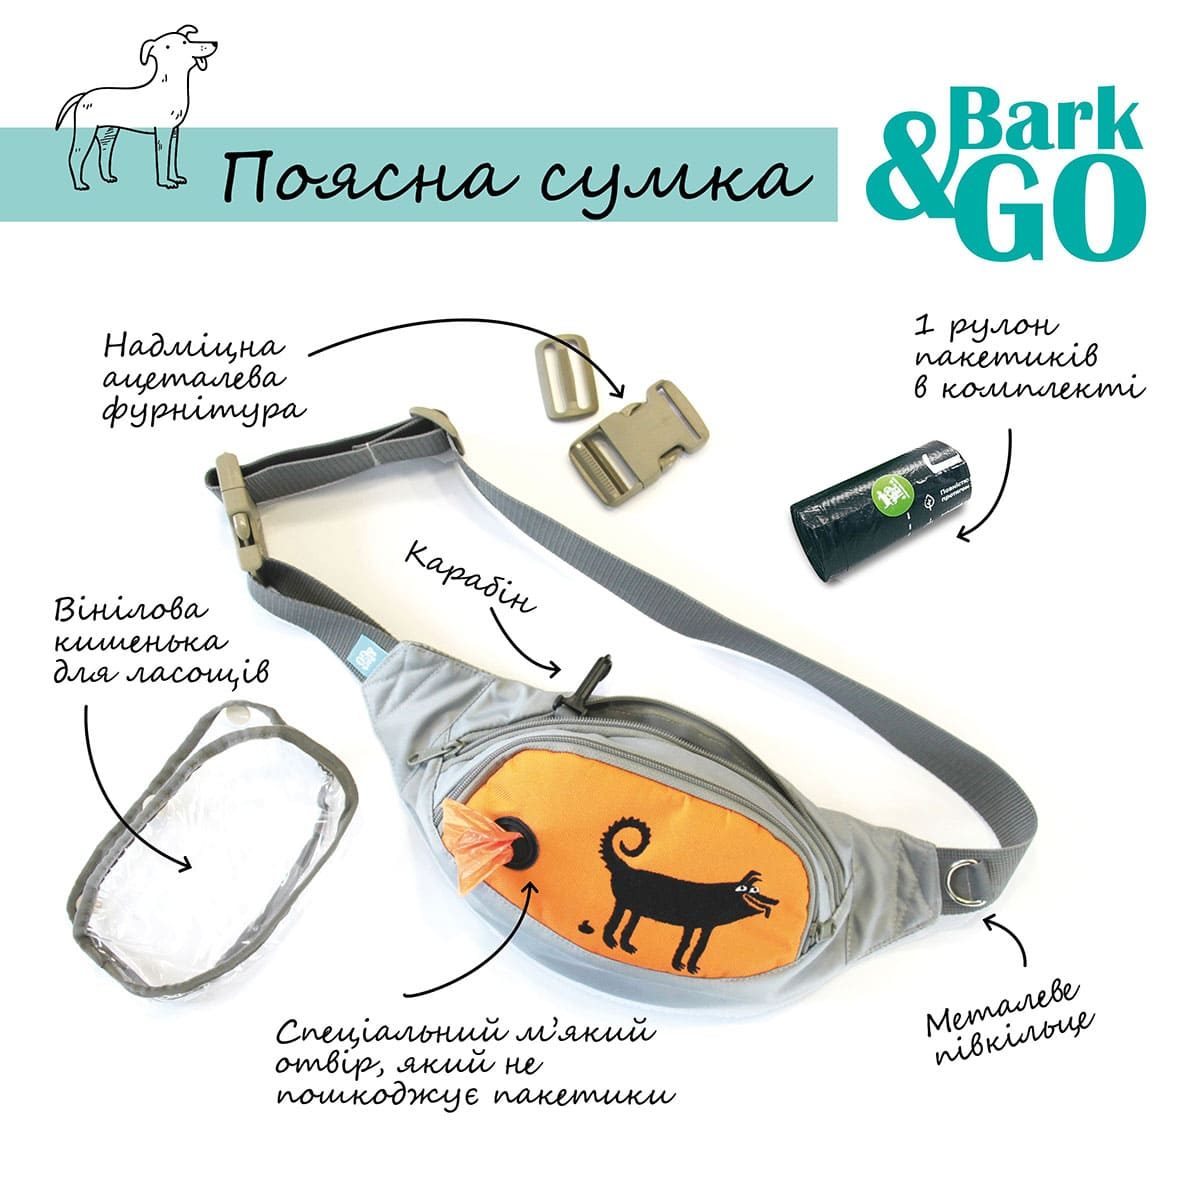 bark-01